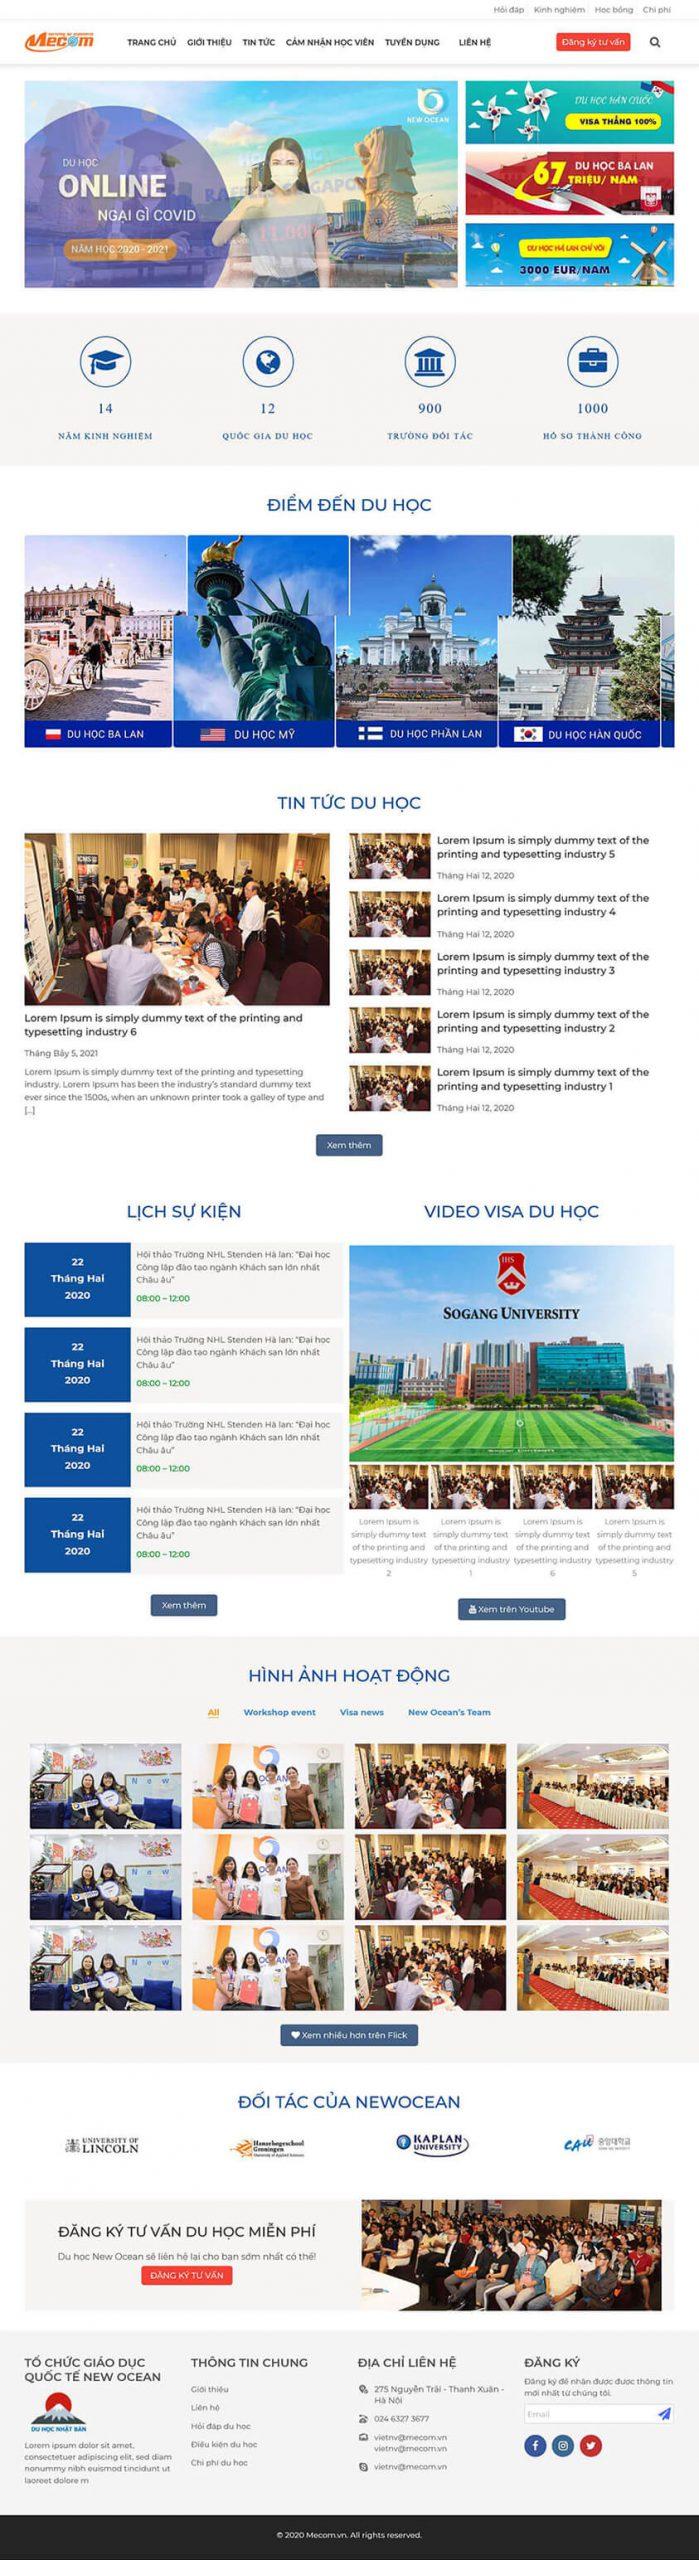 Thiết kế website du học, giáo dục NewOcean